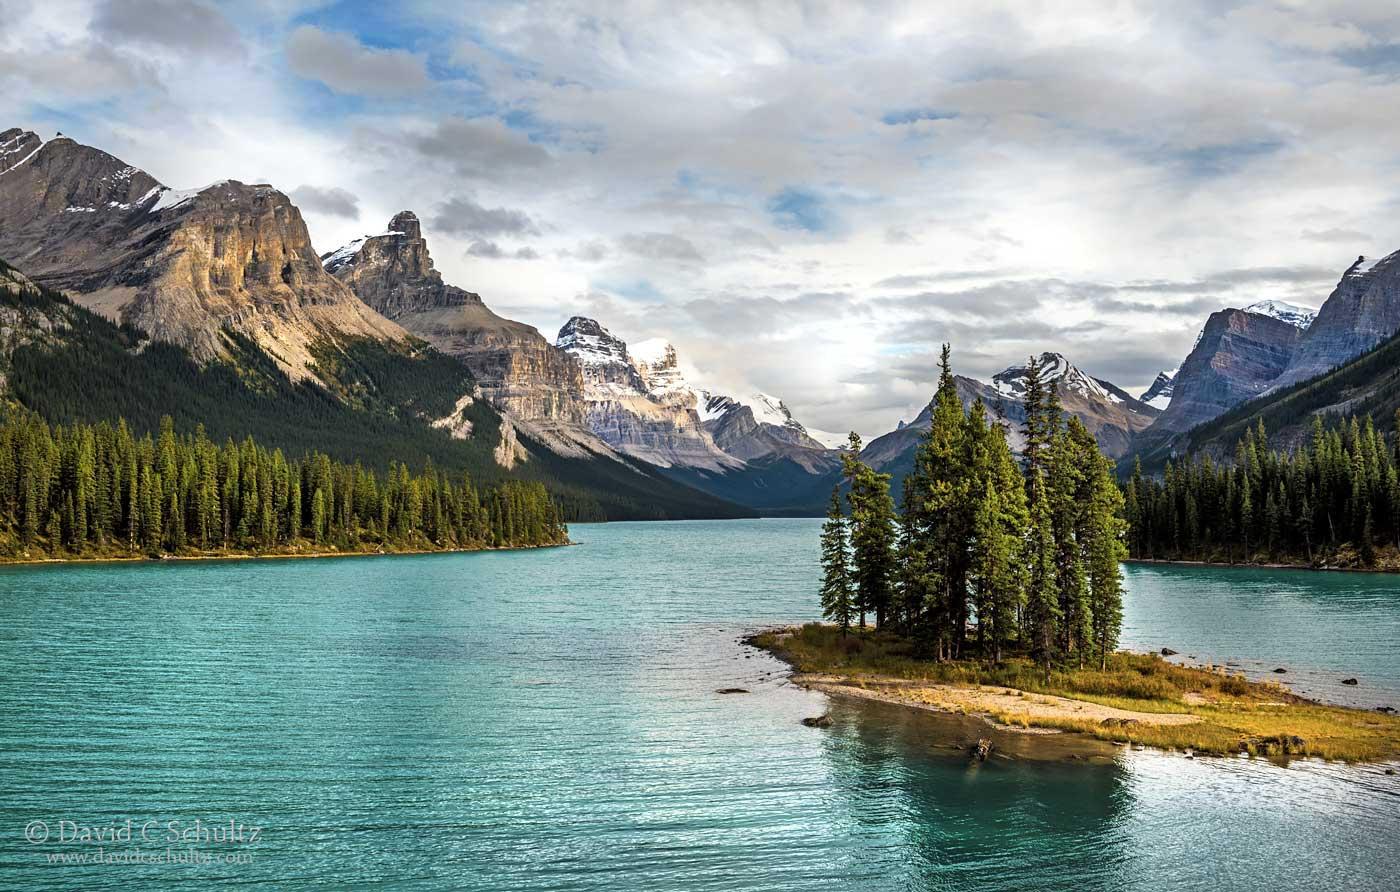 Spirit Island, Jasper National Park, Canada - Image #125-648